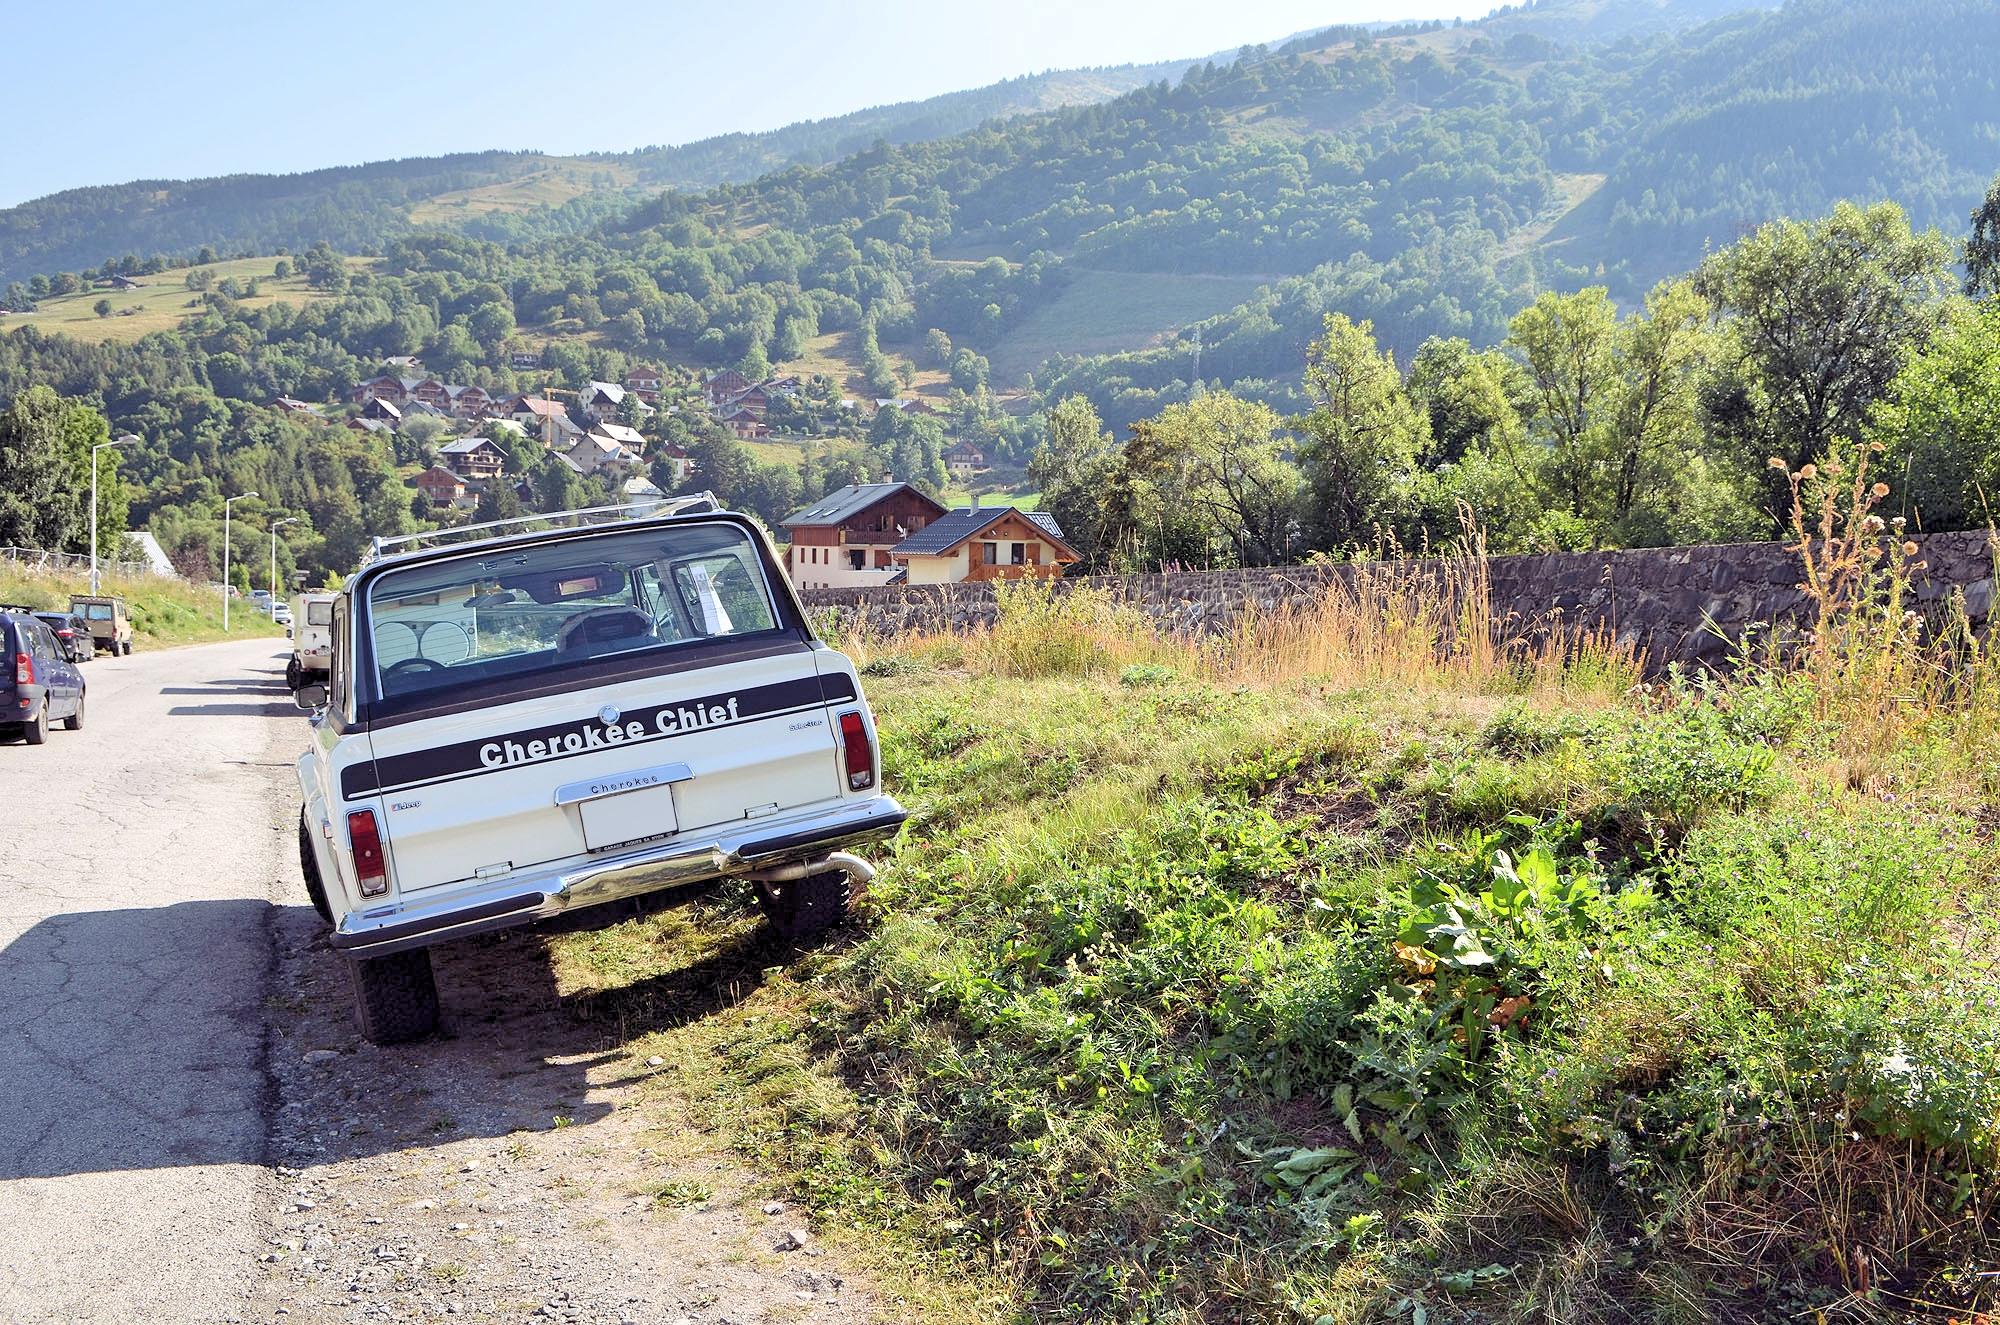 jeep-cherokee-chief-valloire-170.JPG